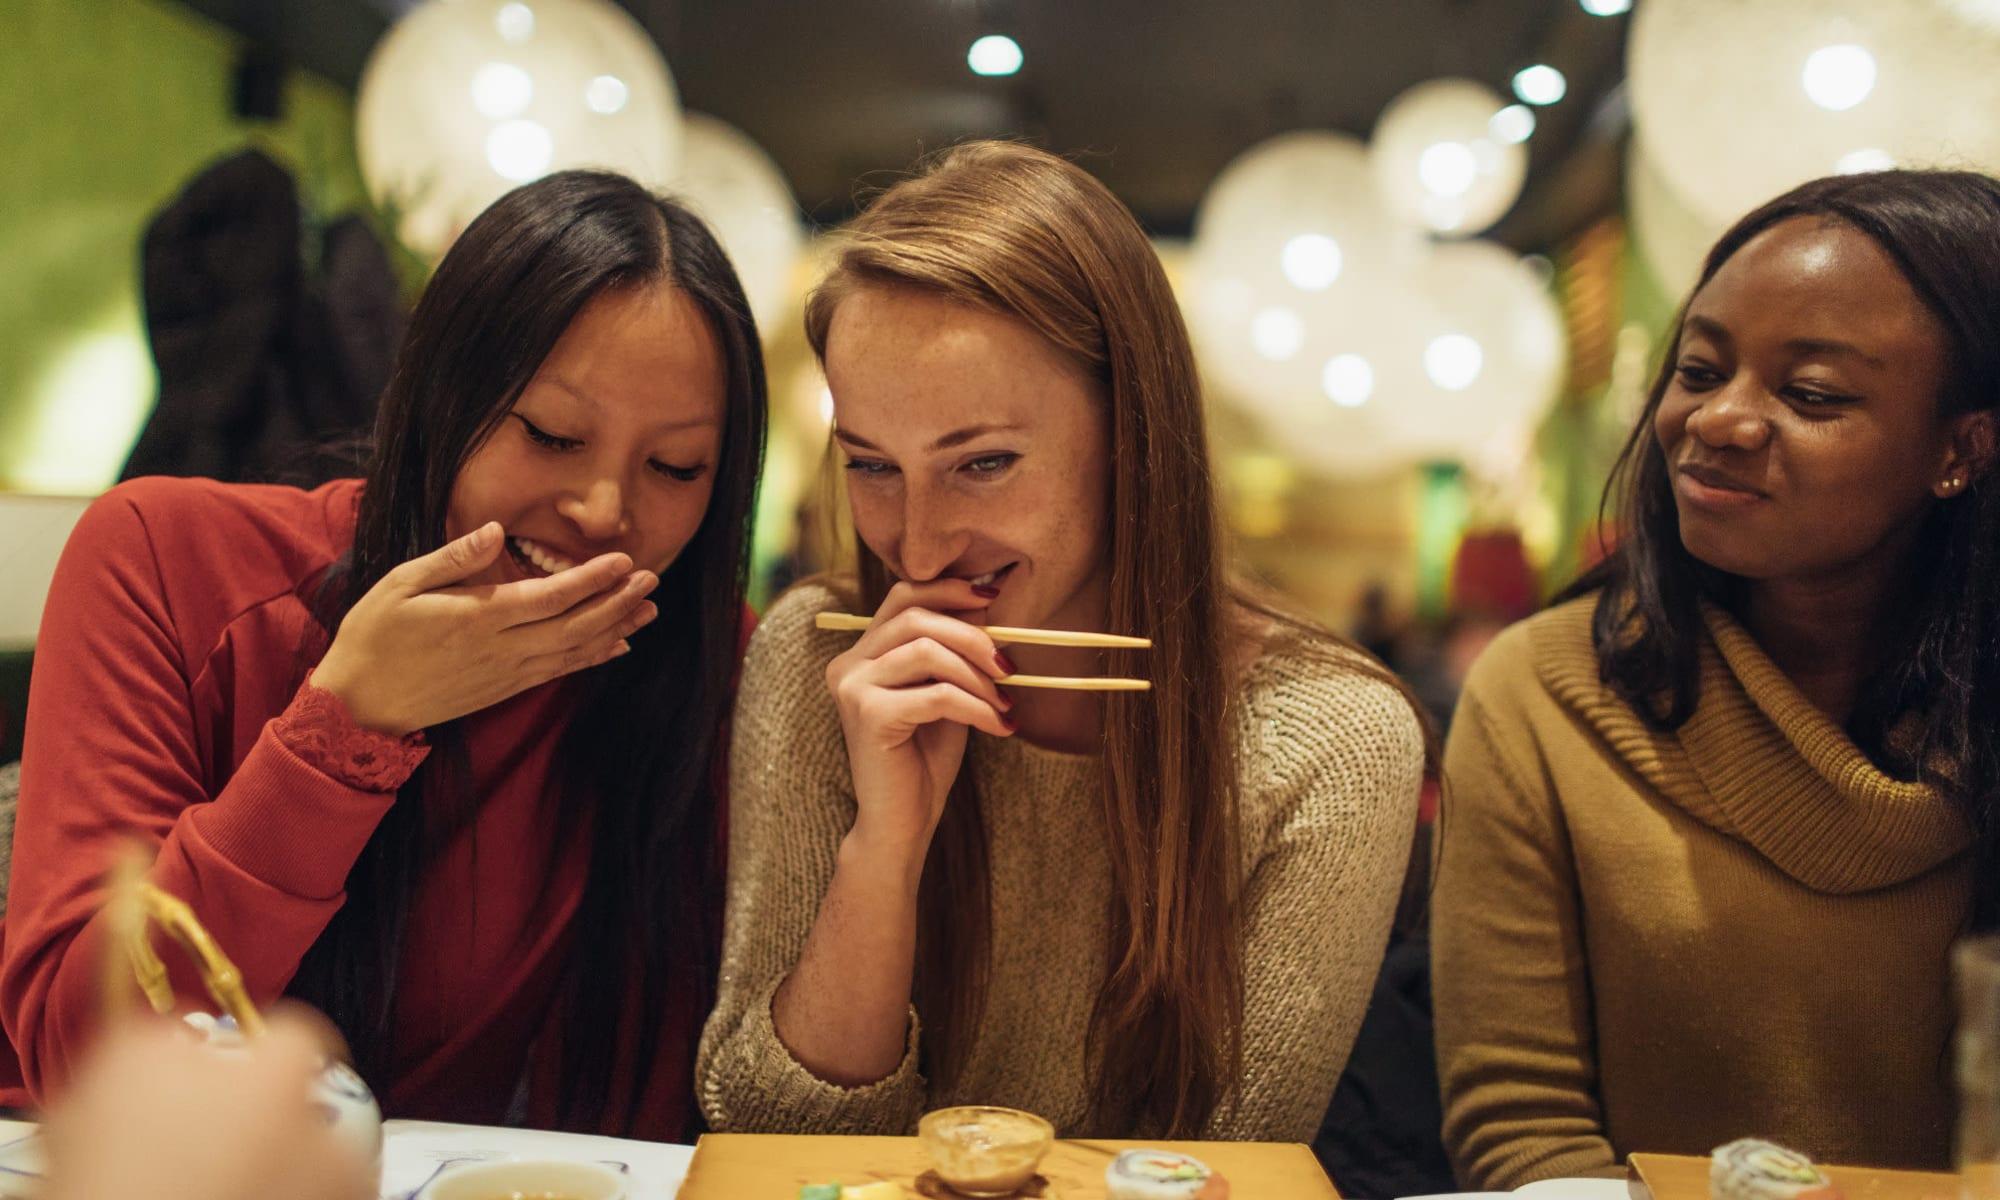 Residents enjoying the restaurants near The Loop on Greenfield in Oak Park, Michigan